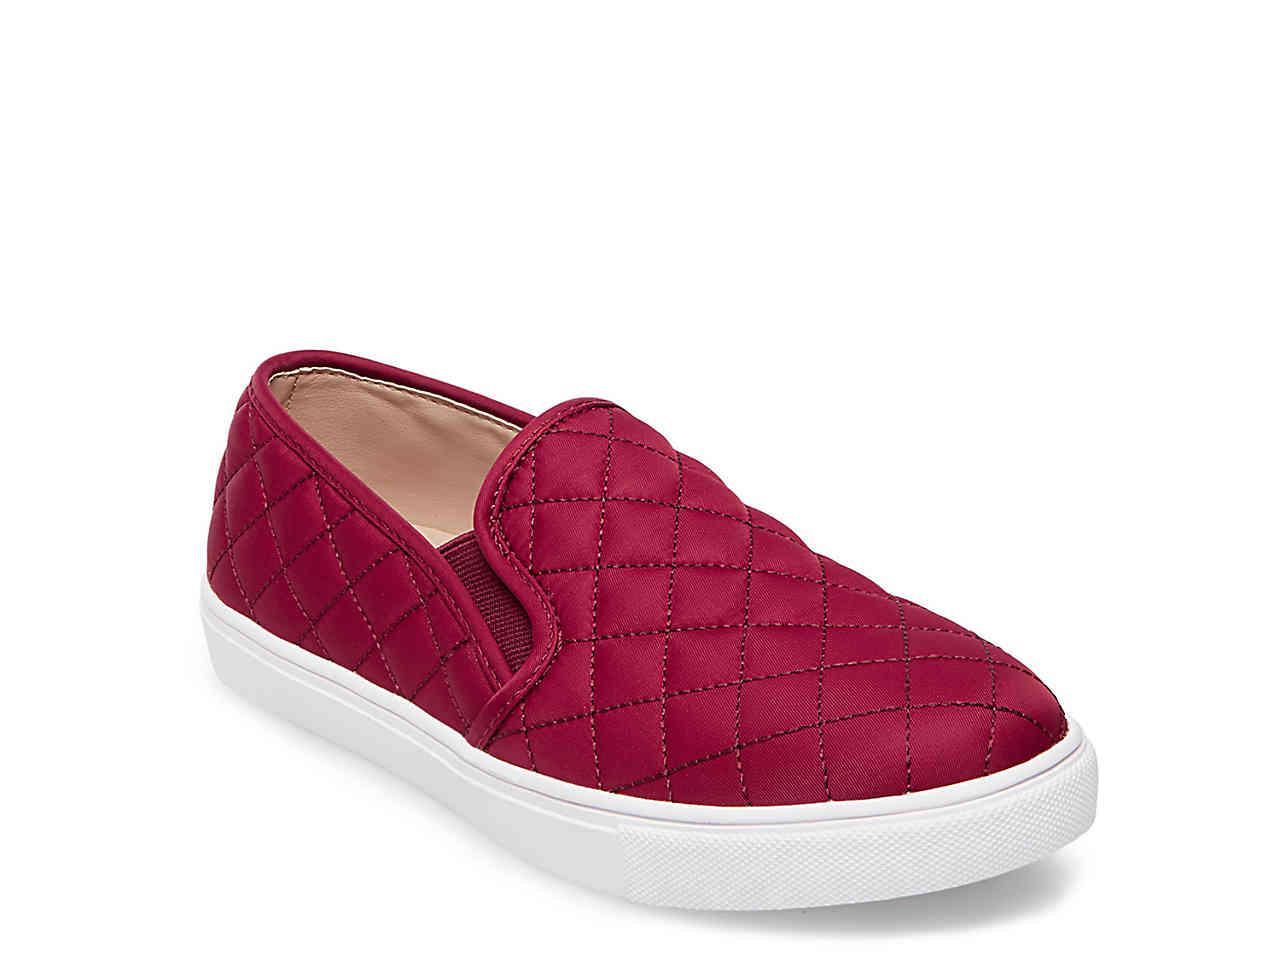 Ecentrcq Slip-on Sneaker in Burgundy